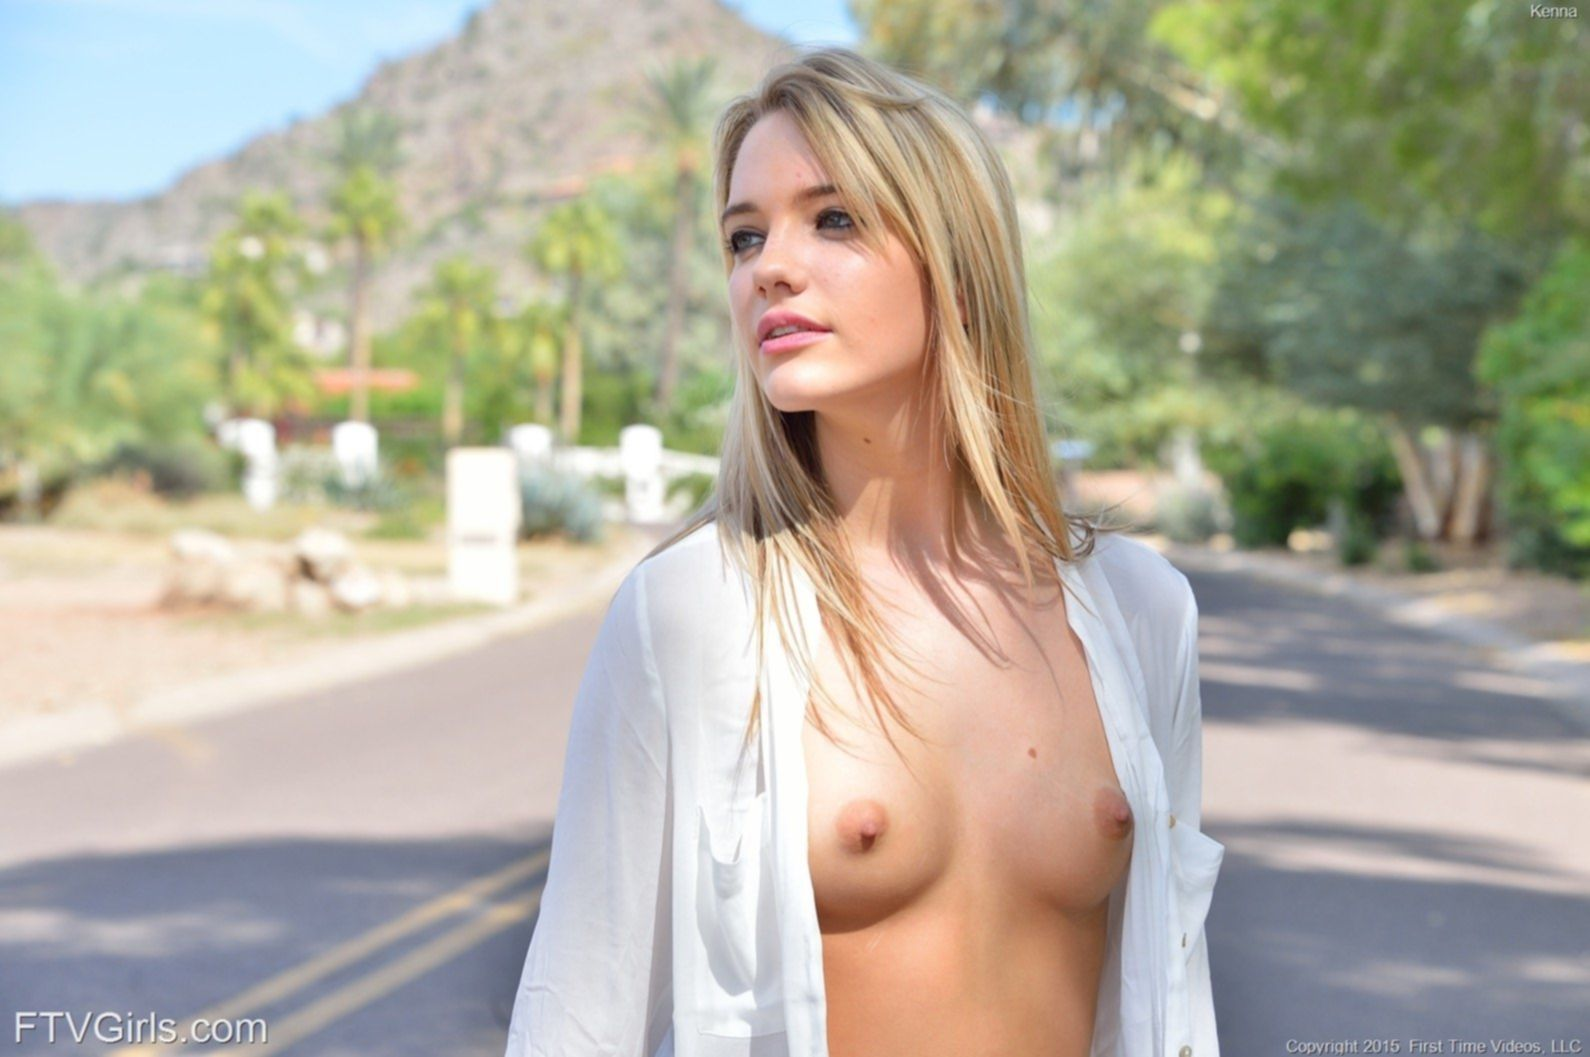 Молодая красотка сняла рубашку и шорты на дороге - фото